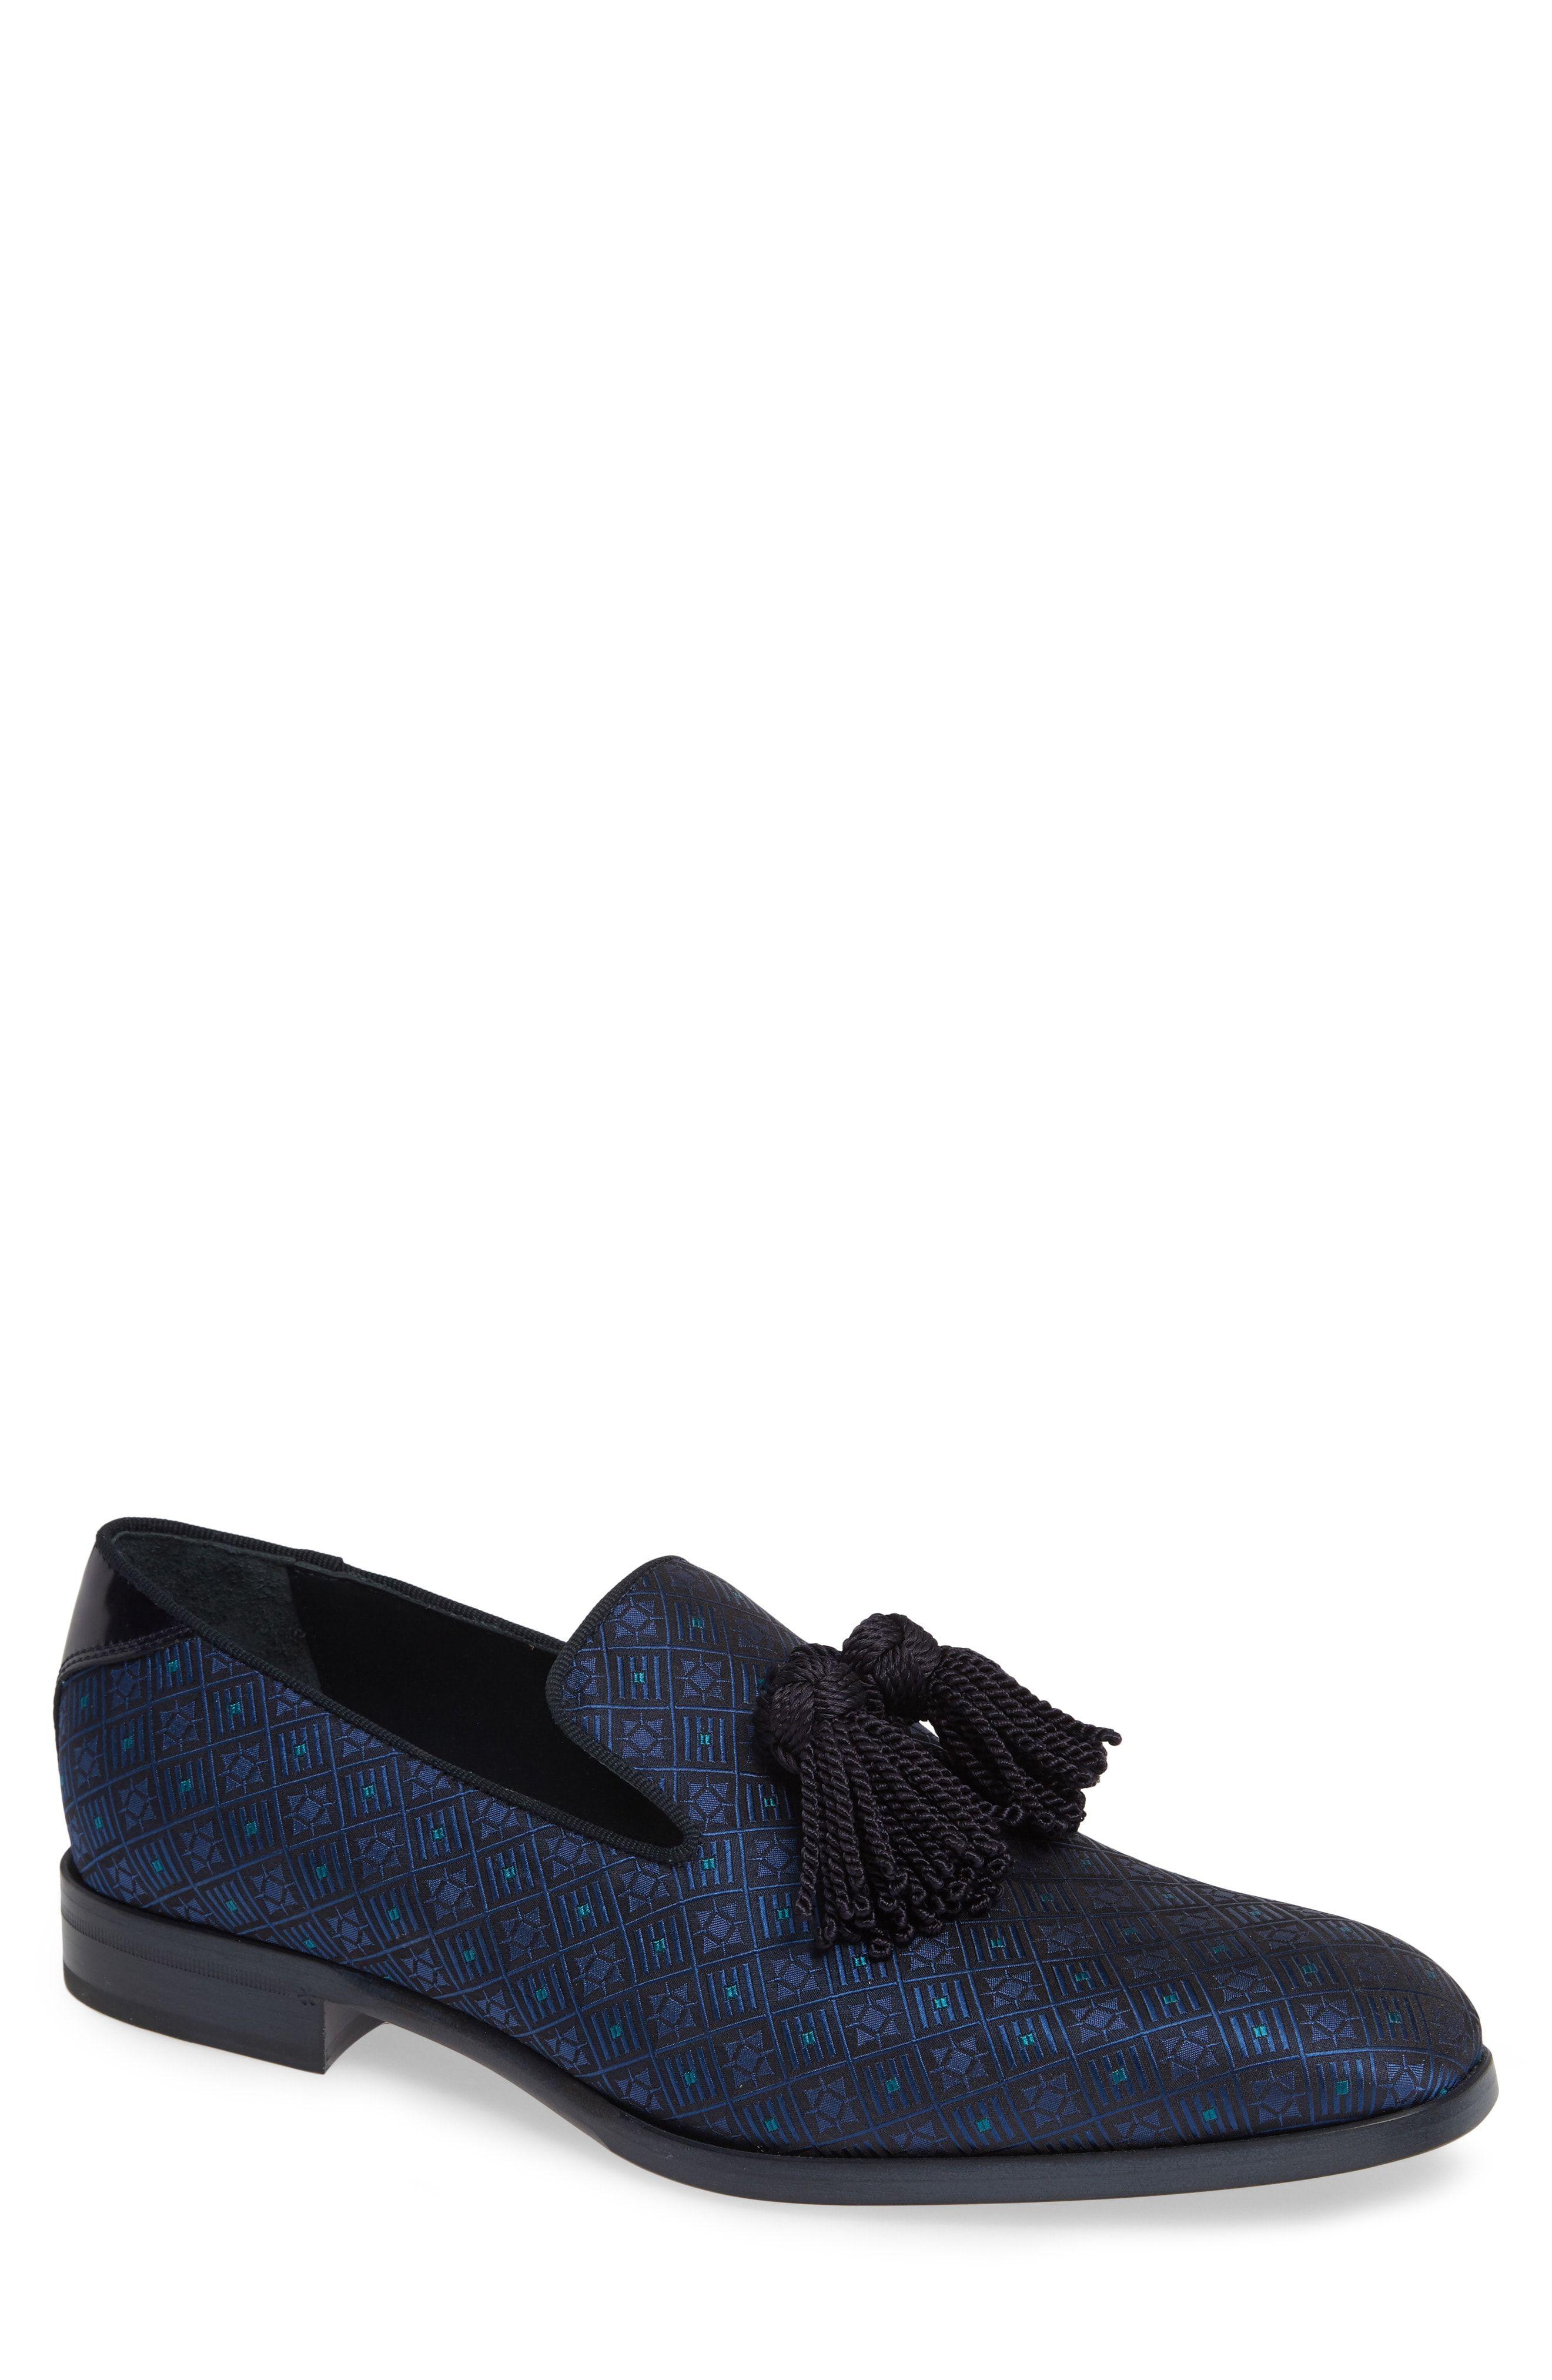 d636f41a859 JIMMY CHOO  FOXLEY  OMBRE GLITTER TASSEL LOAFER.  jimmychoo  shoes ...